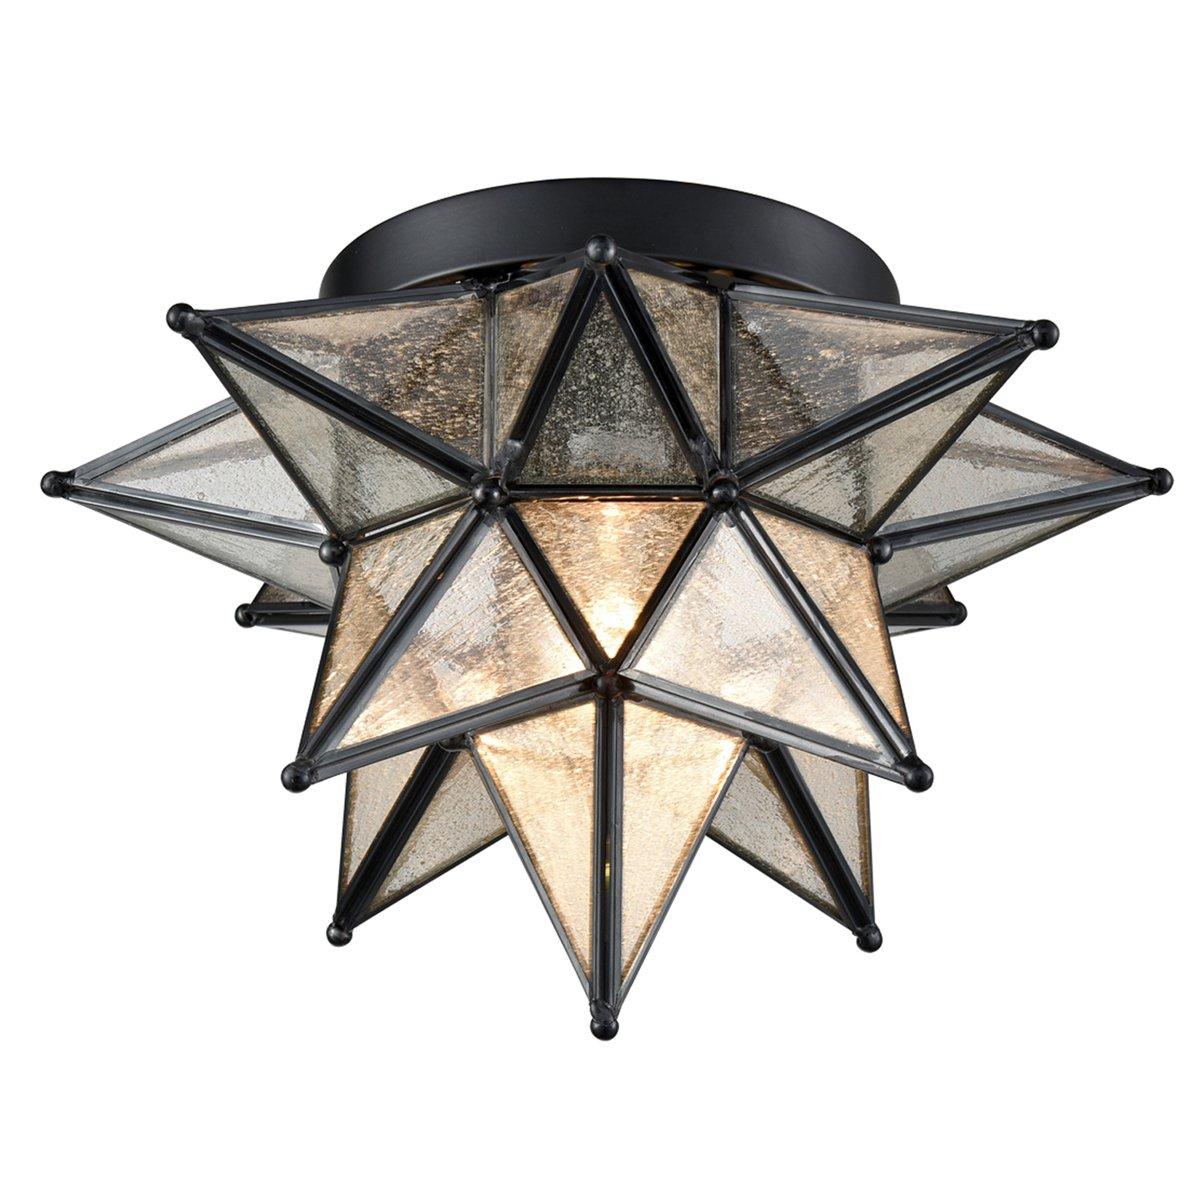 Dazhuan Moravian Star Light Flush Mount Celing Light Etched Seeded Glass Shade Boho Moroccan Ceiling Lamp for Kitchen Foyer, 1-Light